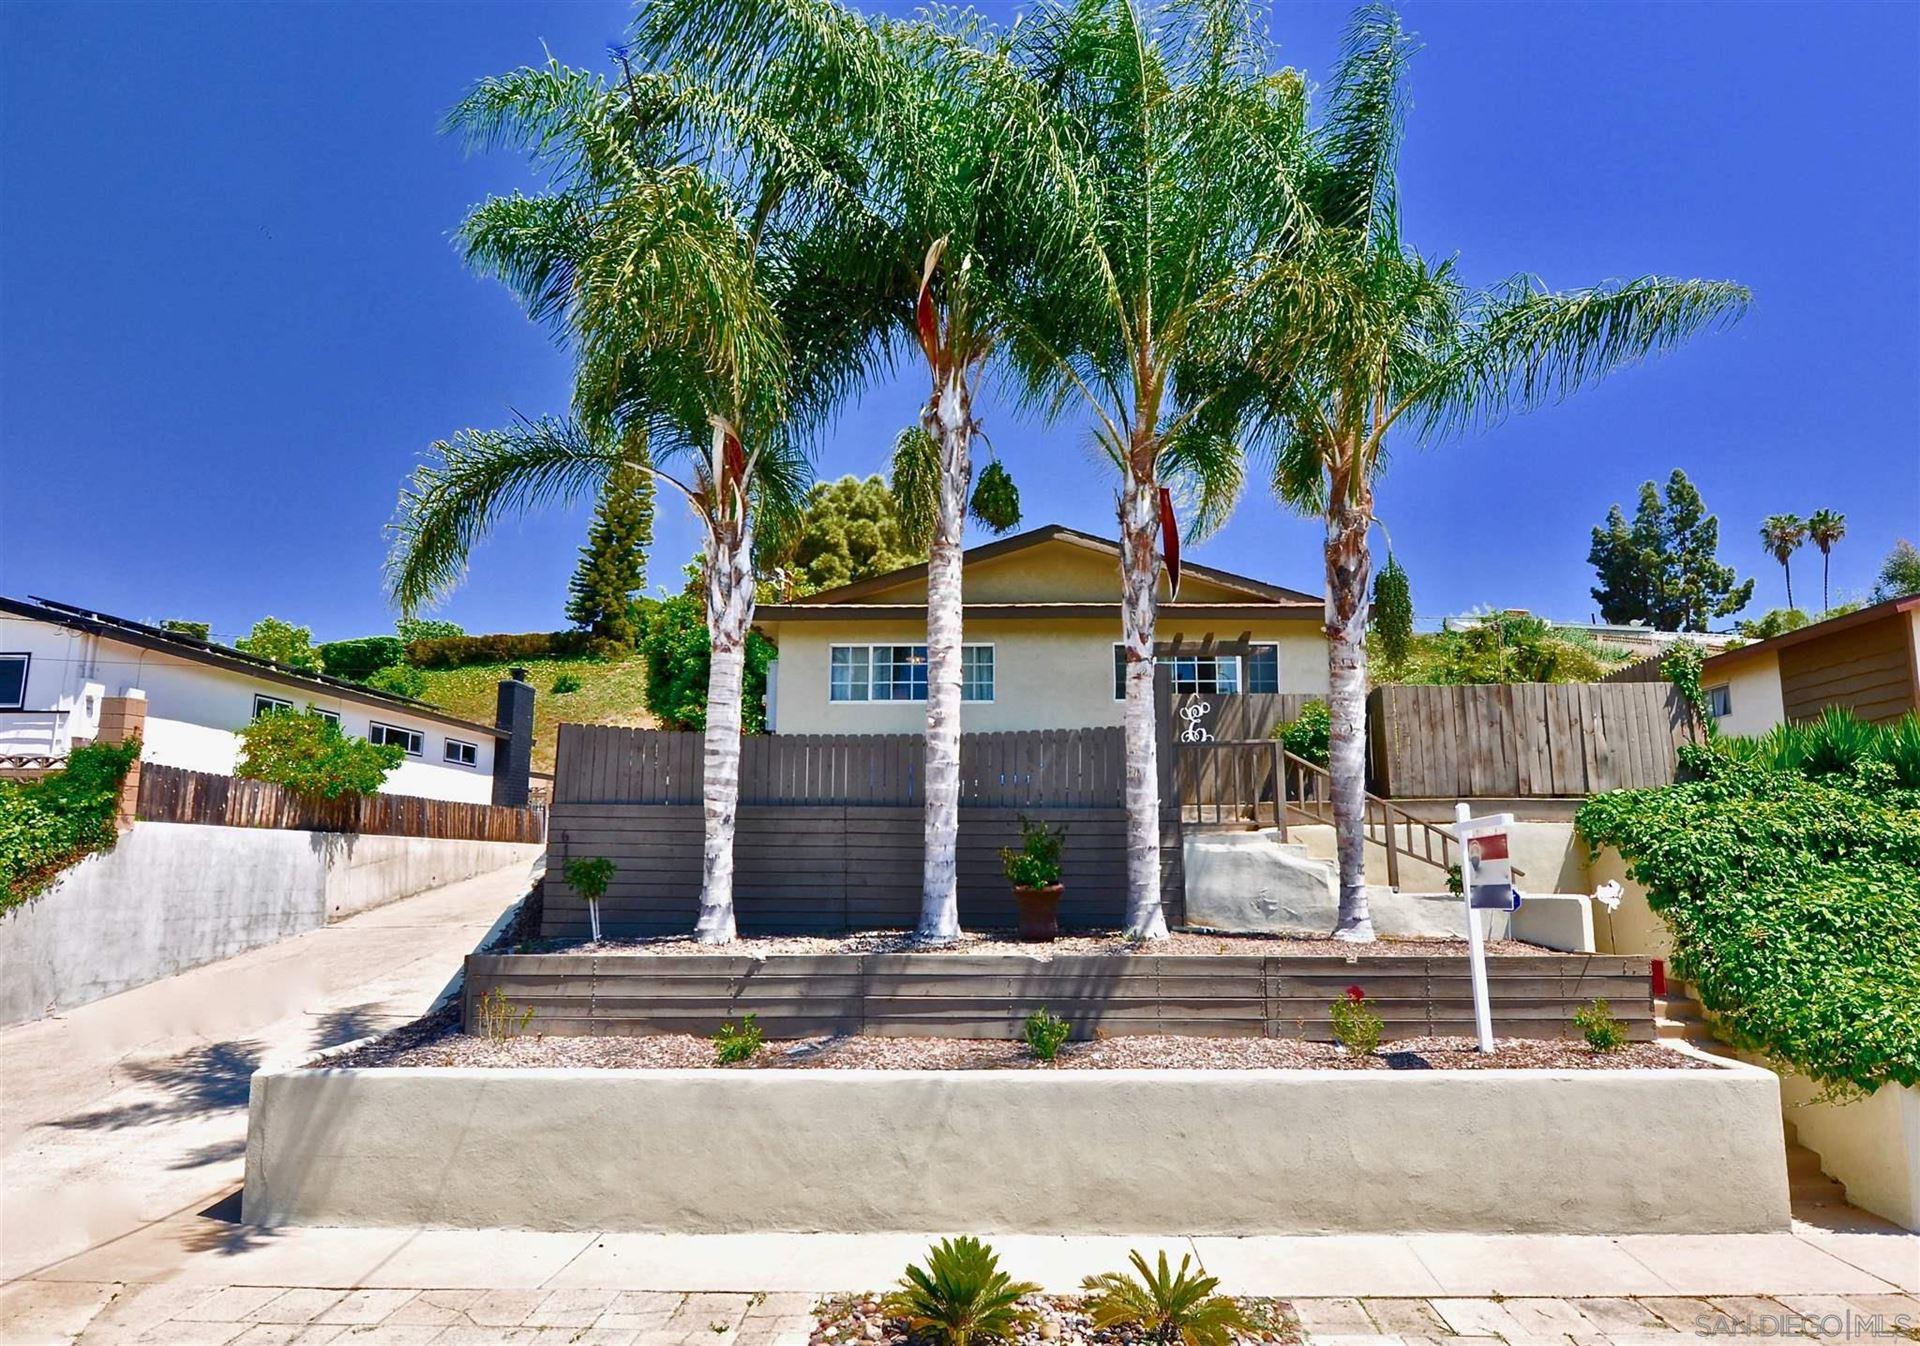 Photo of 6125 Avenorra Drive, La Mesa, CA 91942 (MLS # 210011467)